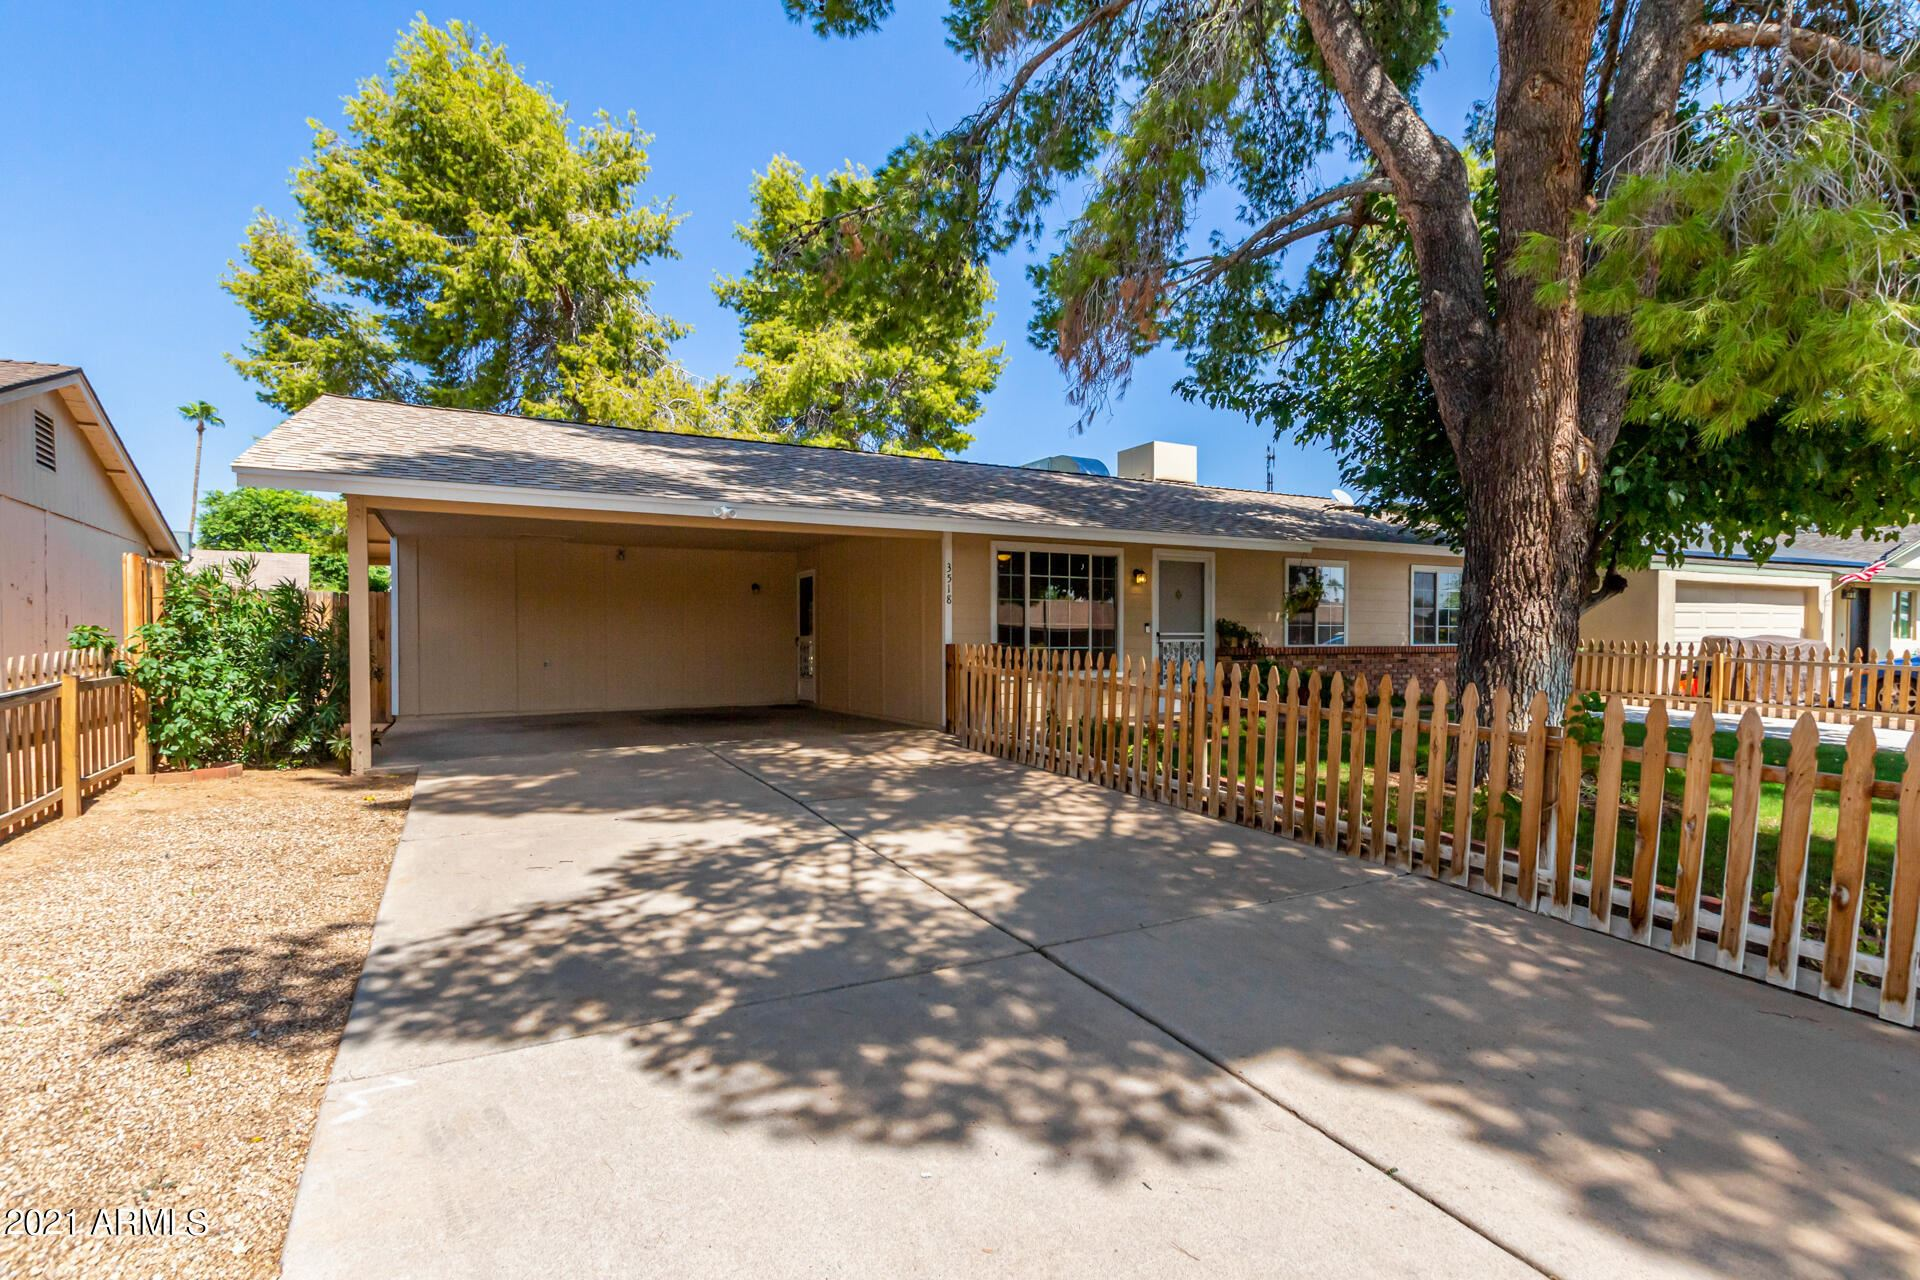 3518 E HARTFORD Avenue, Phoenix, AZ 85032 - MLS#: 6292085